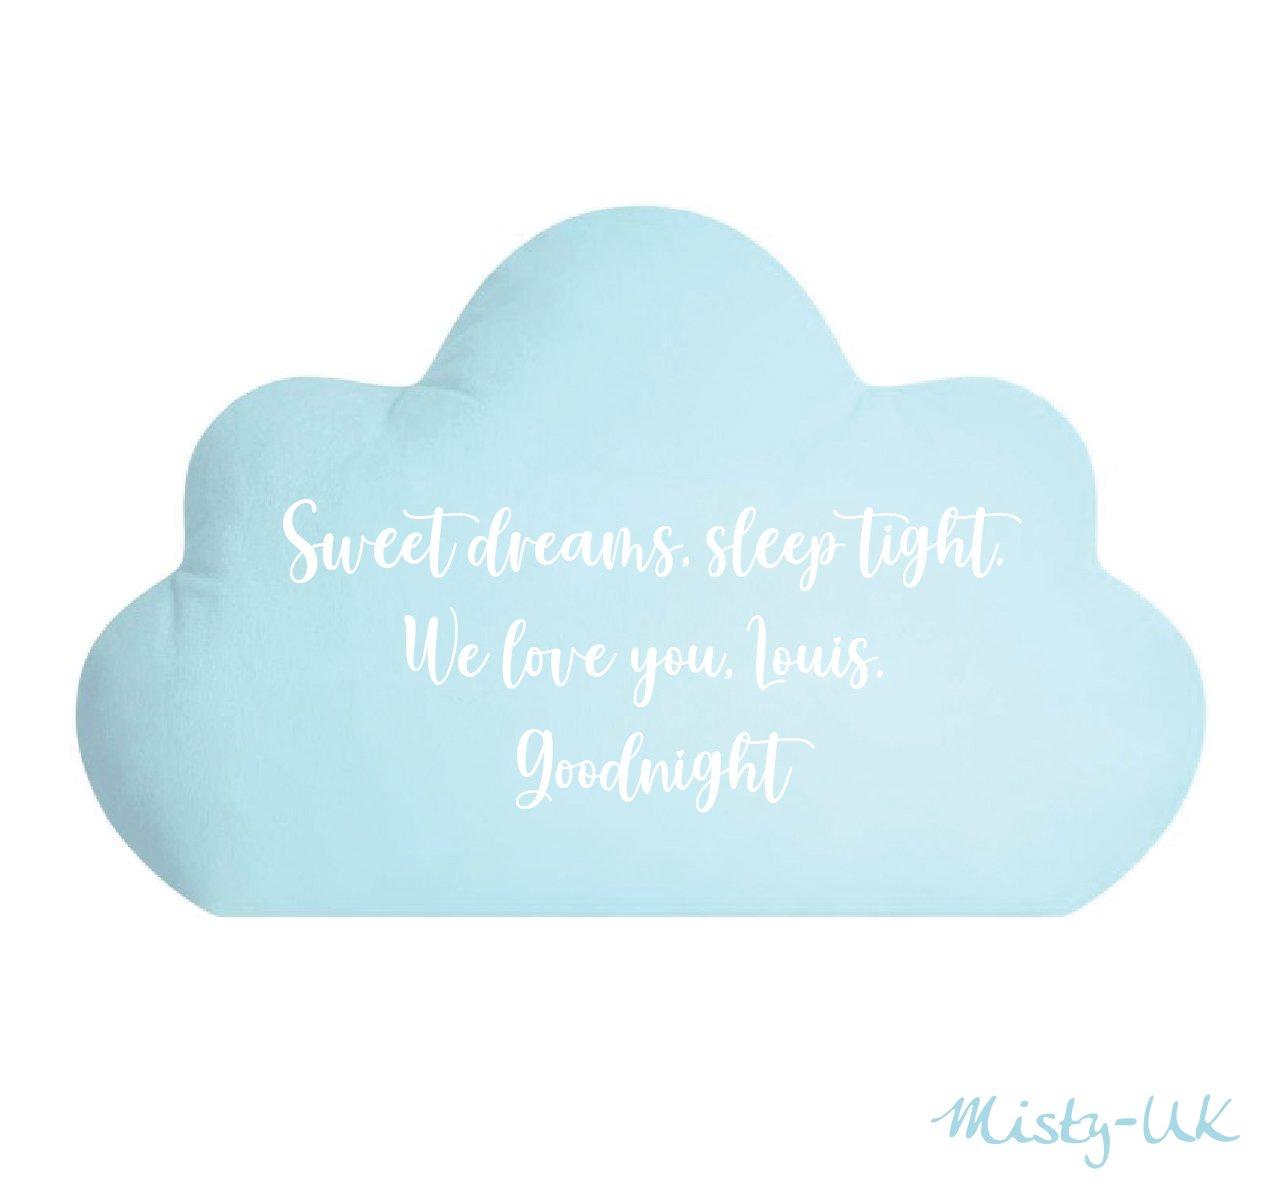 Sweet Dream Sleep Tight